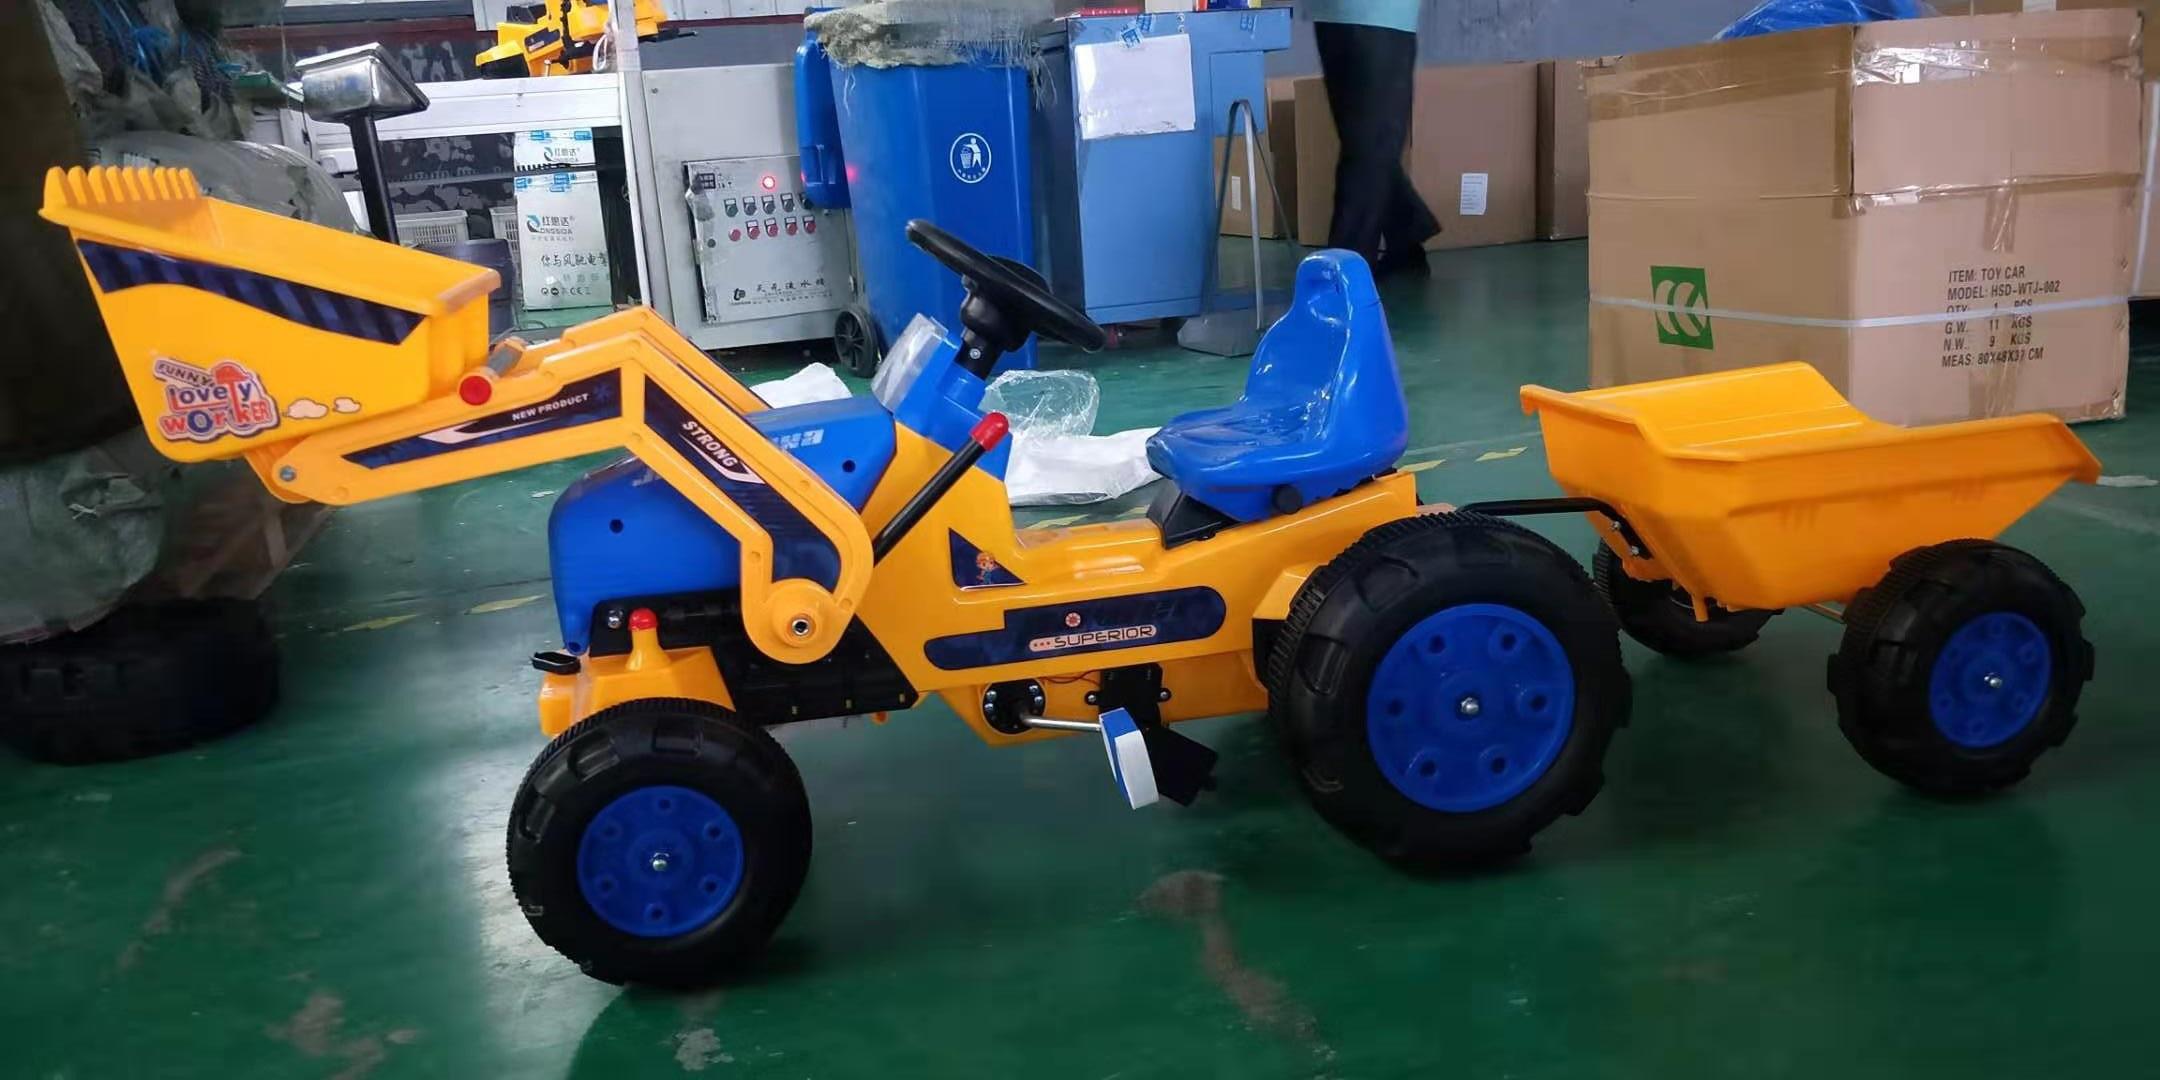 Tractor de pedales strong superior Amarillo